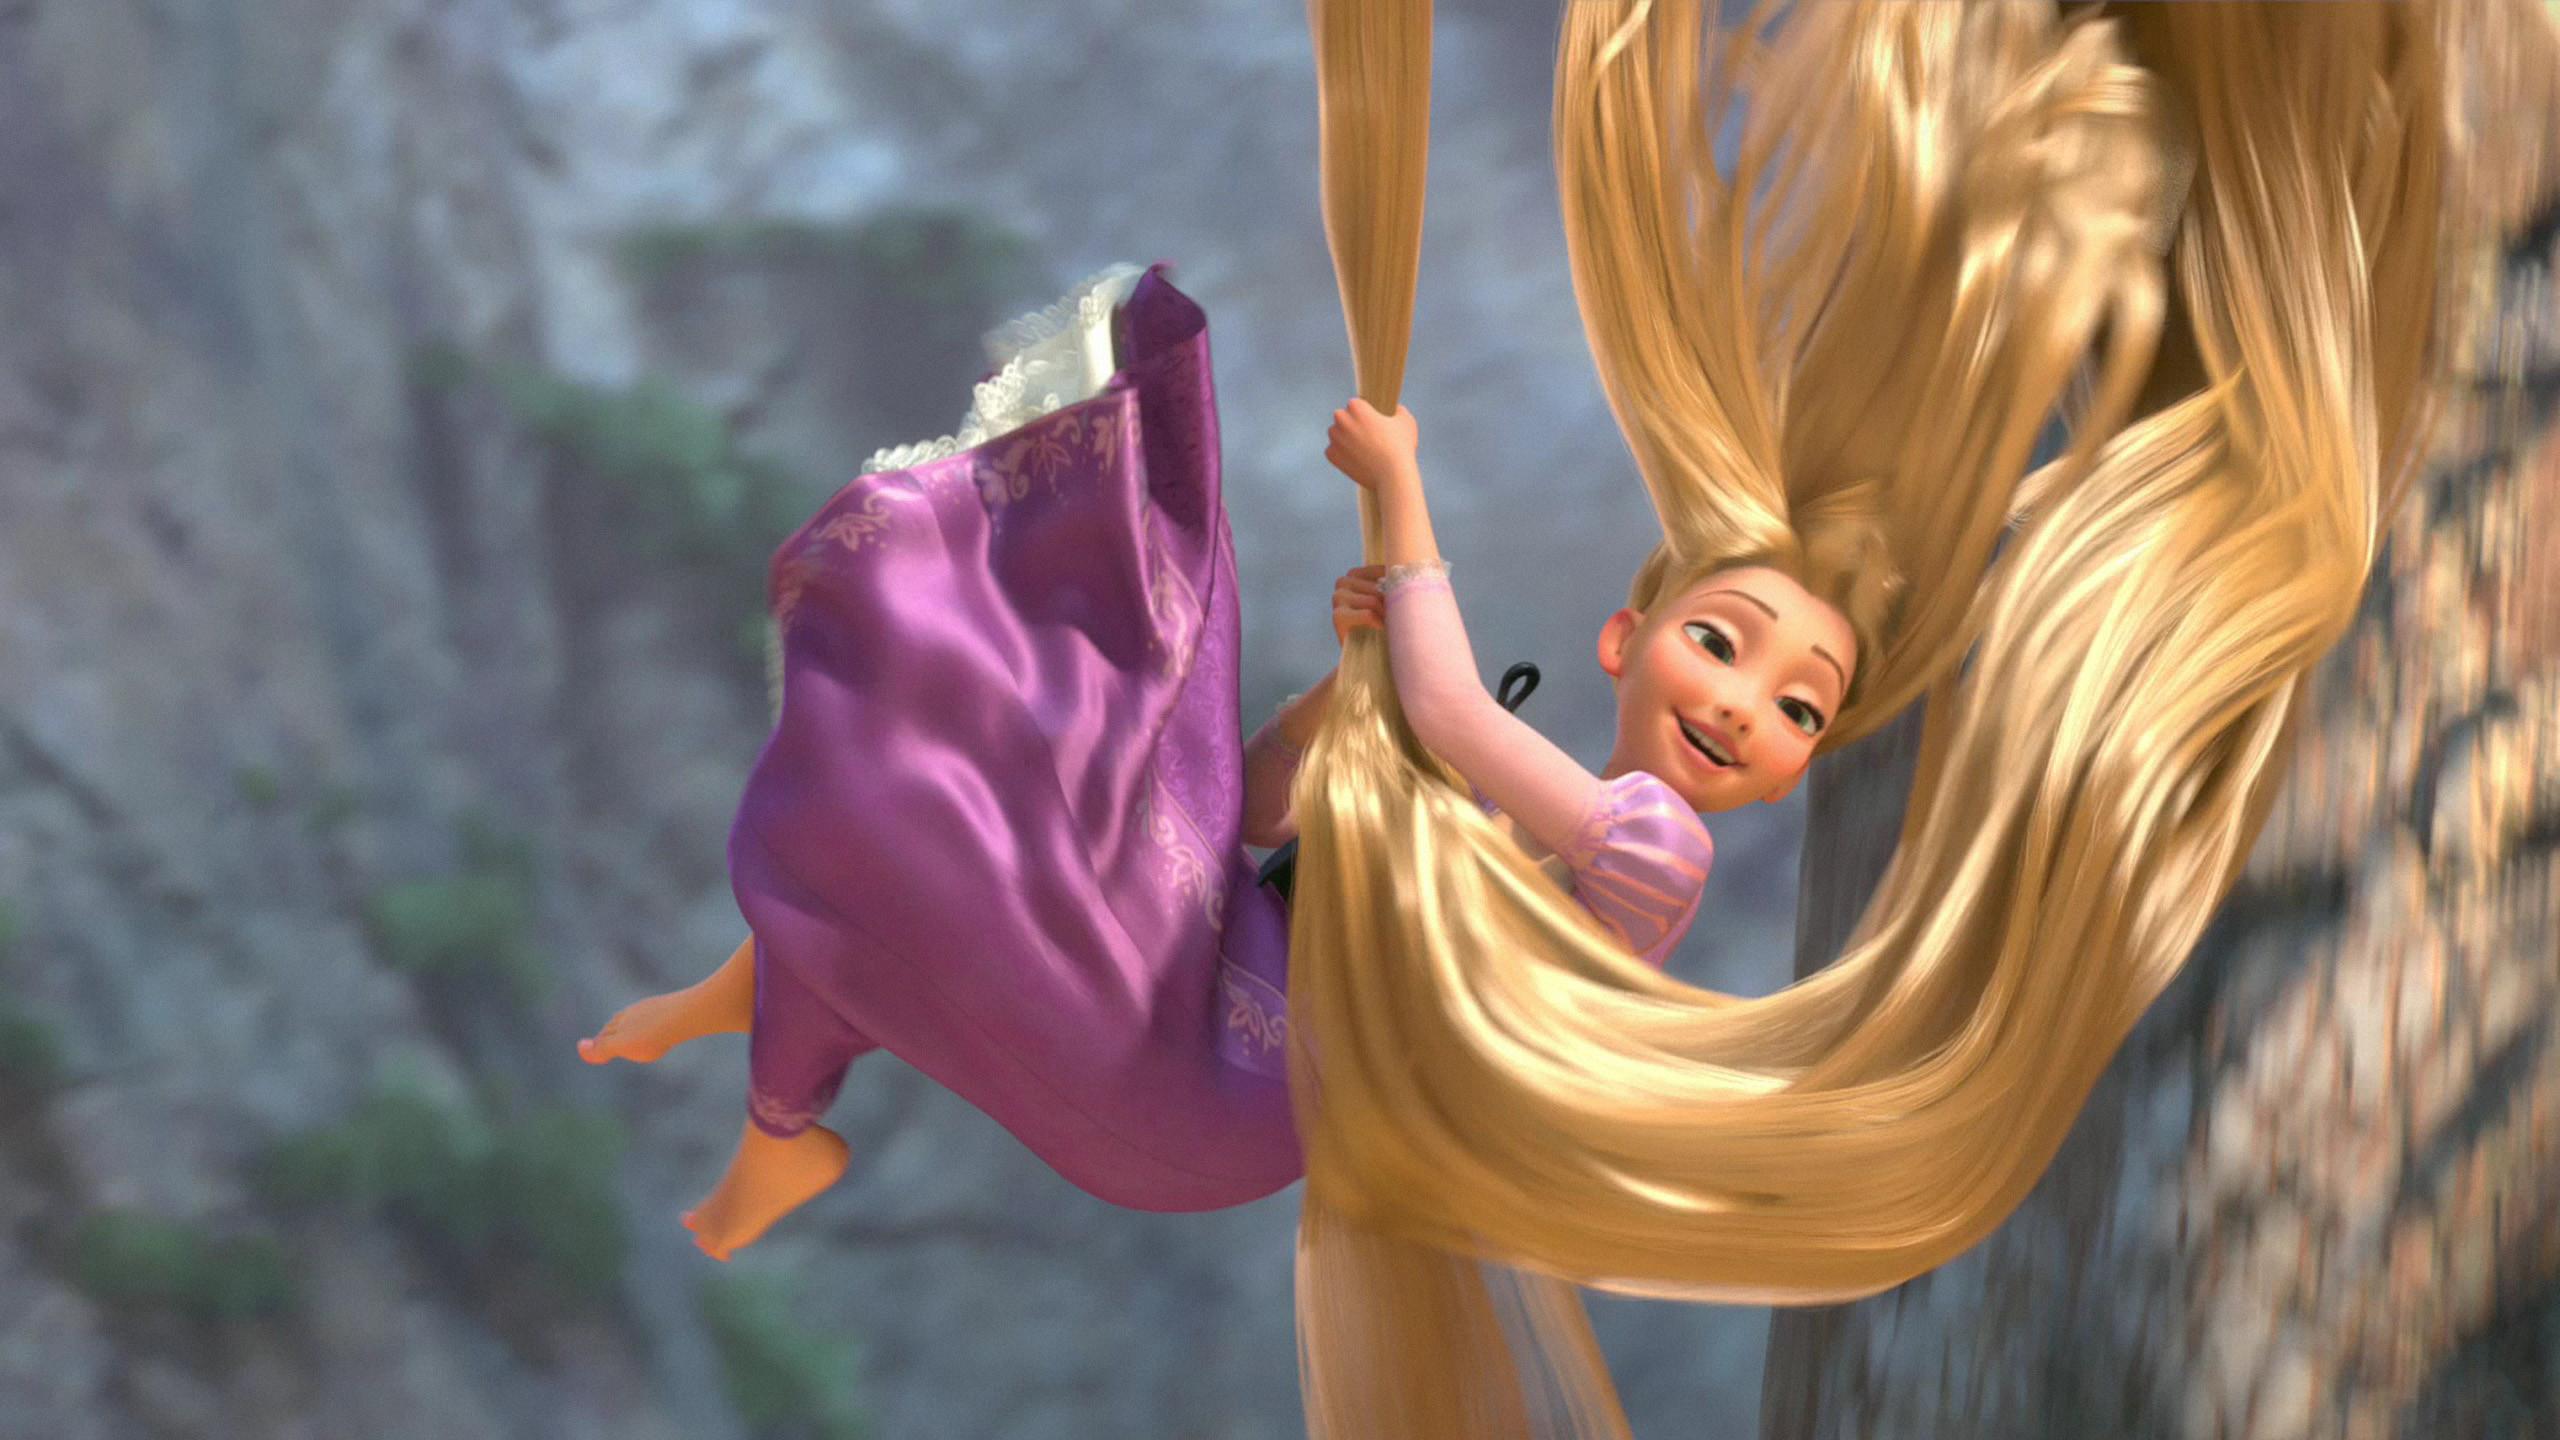 Disney Tangled Cartoon HD Wallpaper Image for iPhone 6